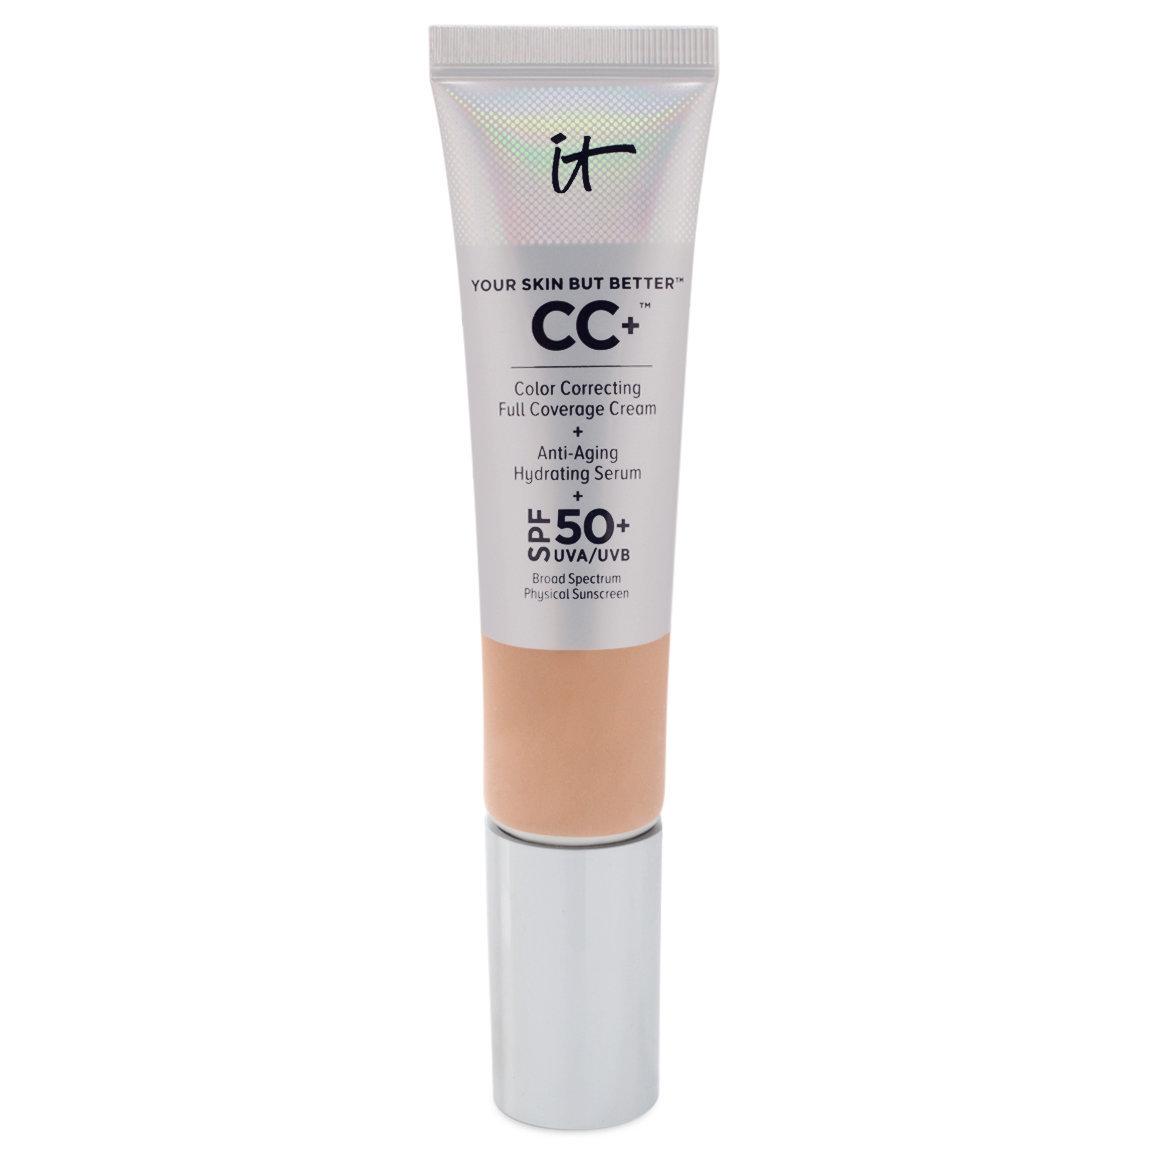 IT Cosmetics  CC+ Cream with SPF 50+ Tan alternative view 1.